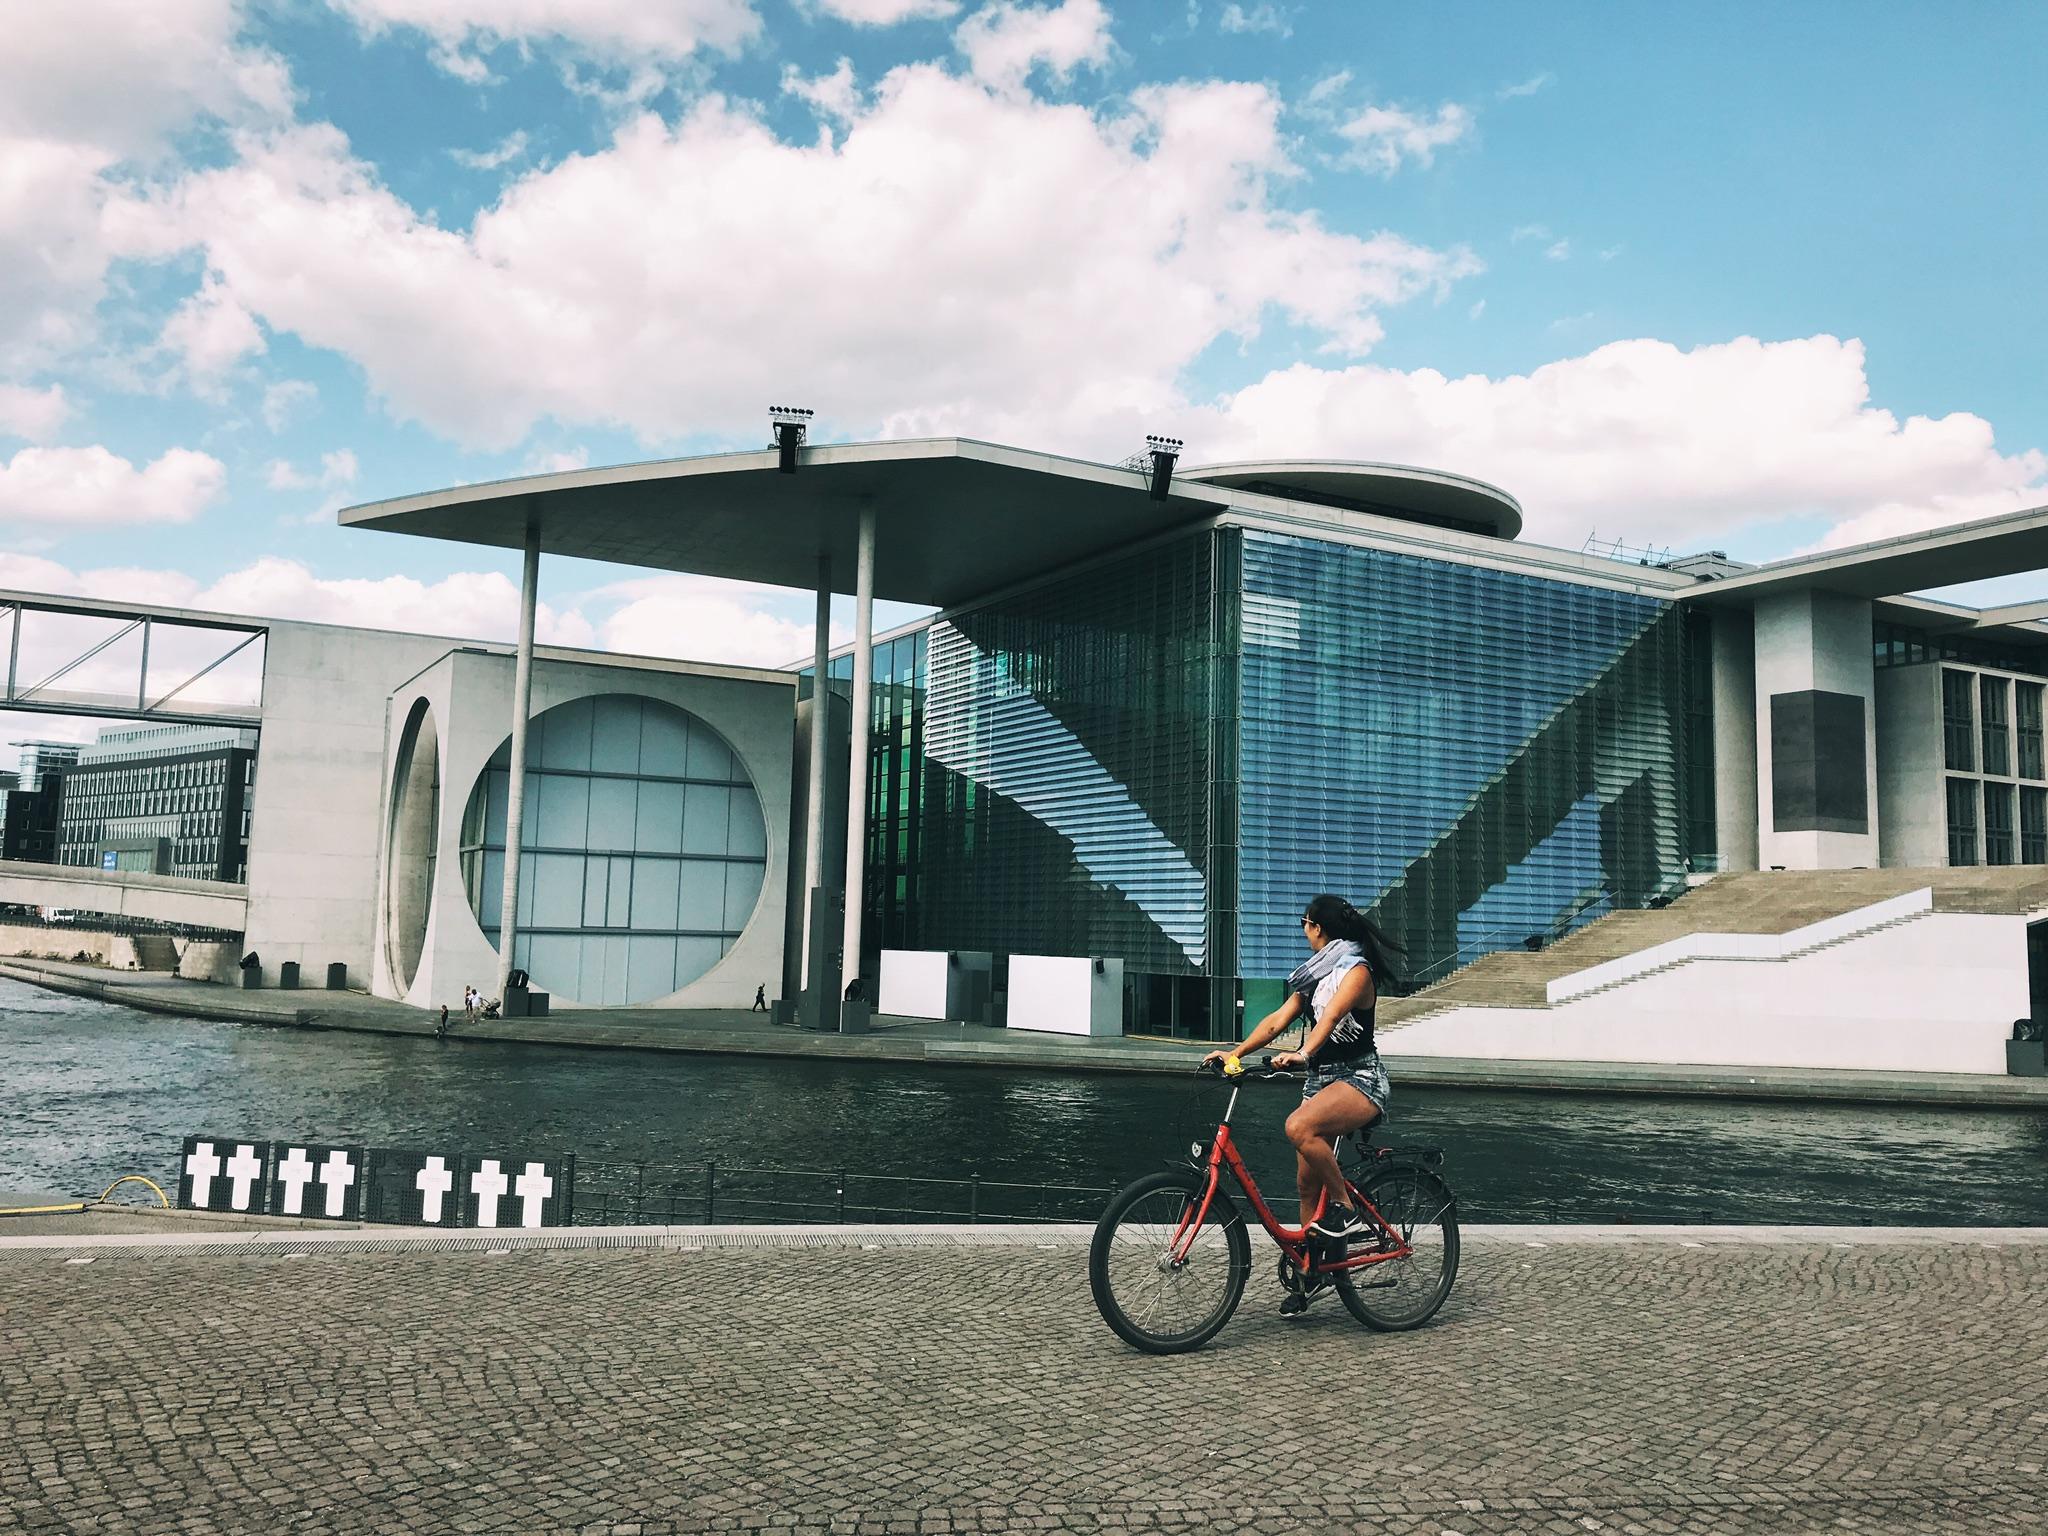 Admiring Berlin's architeture